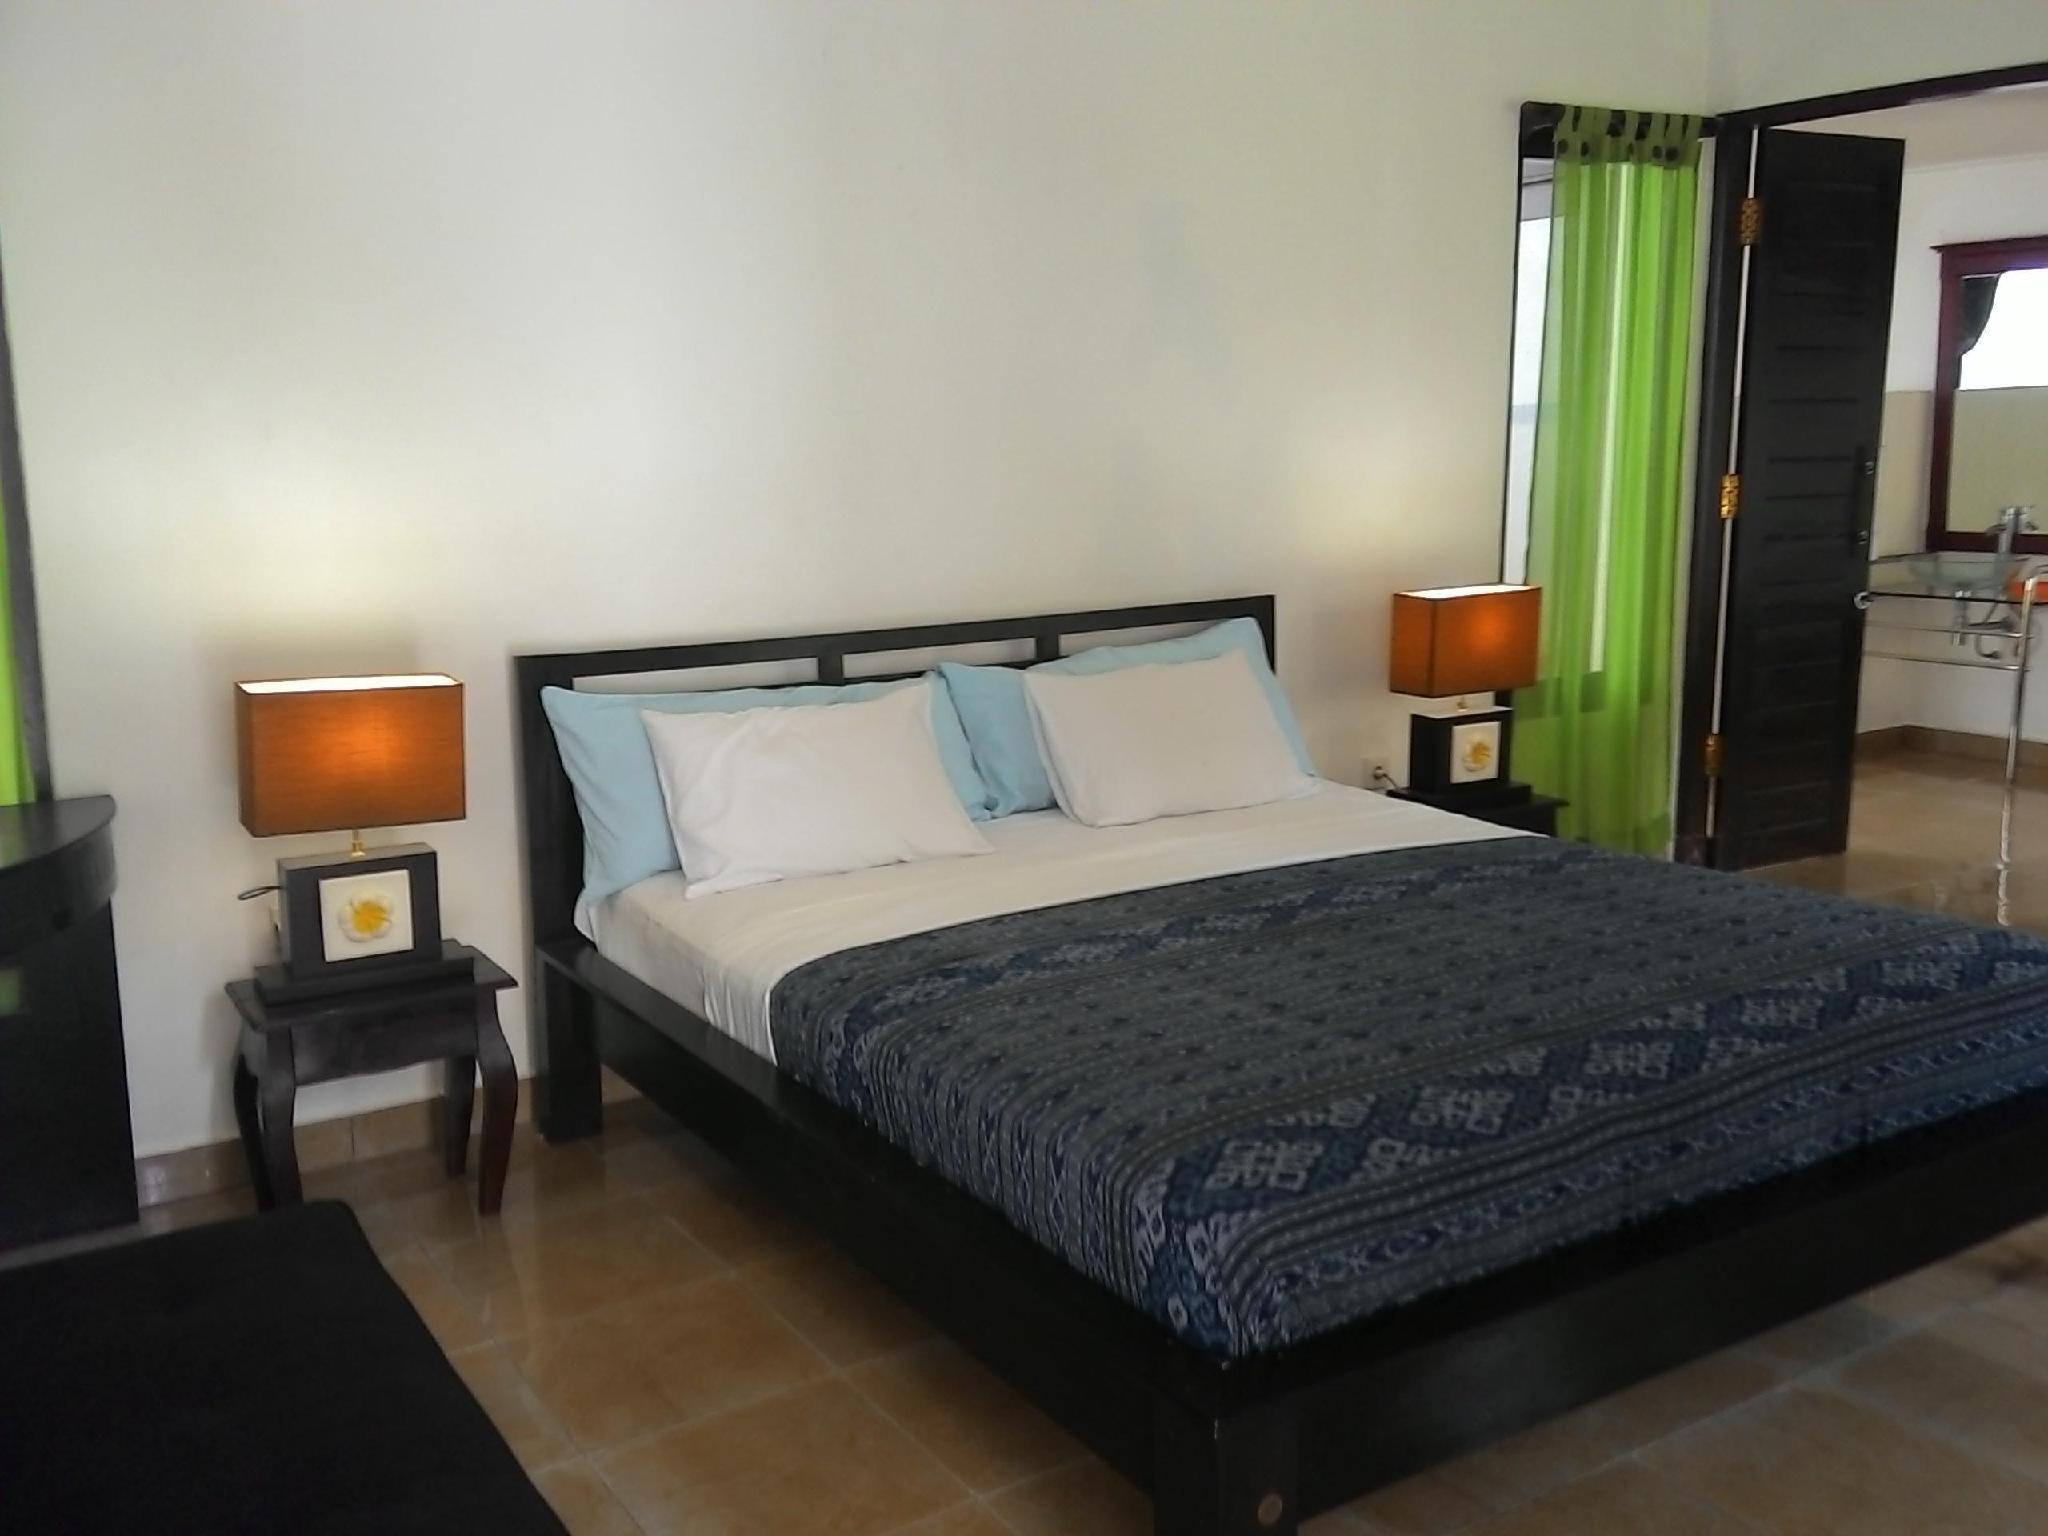 Lovina Villa Cinta, Buleleng